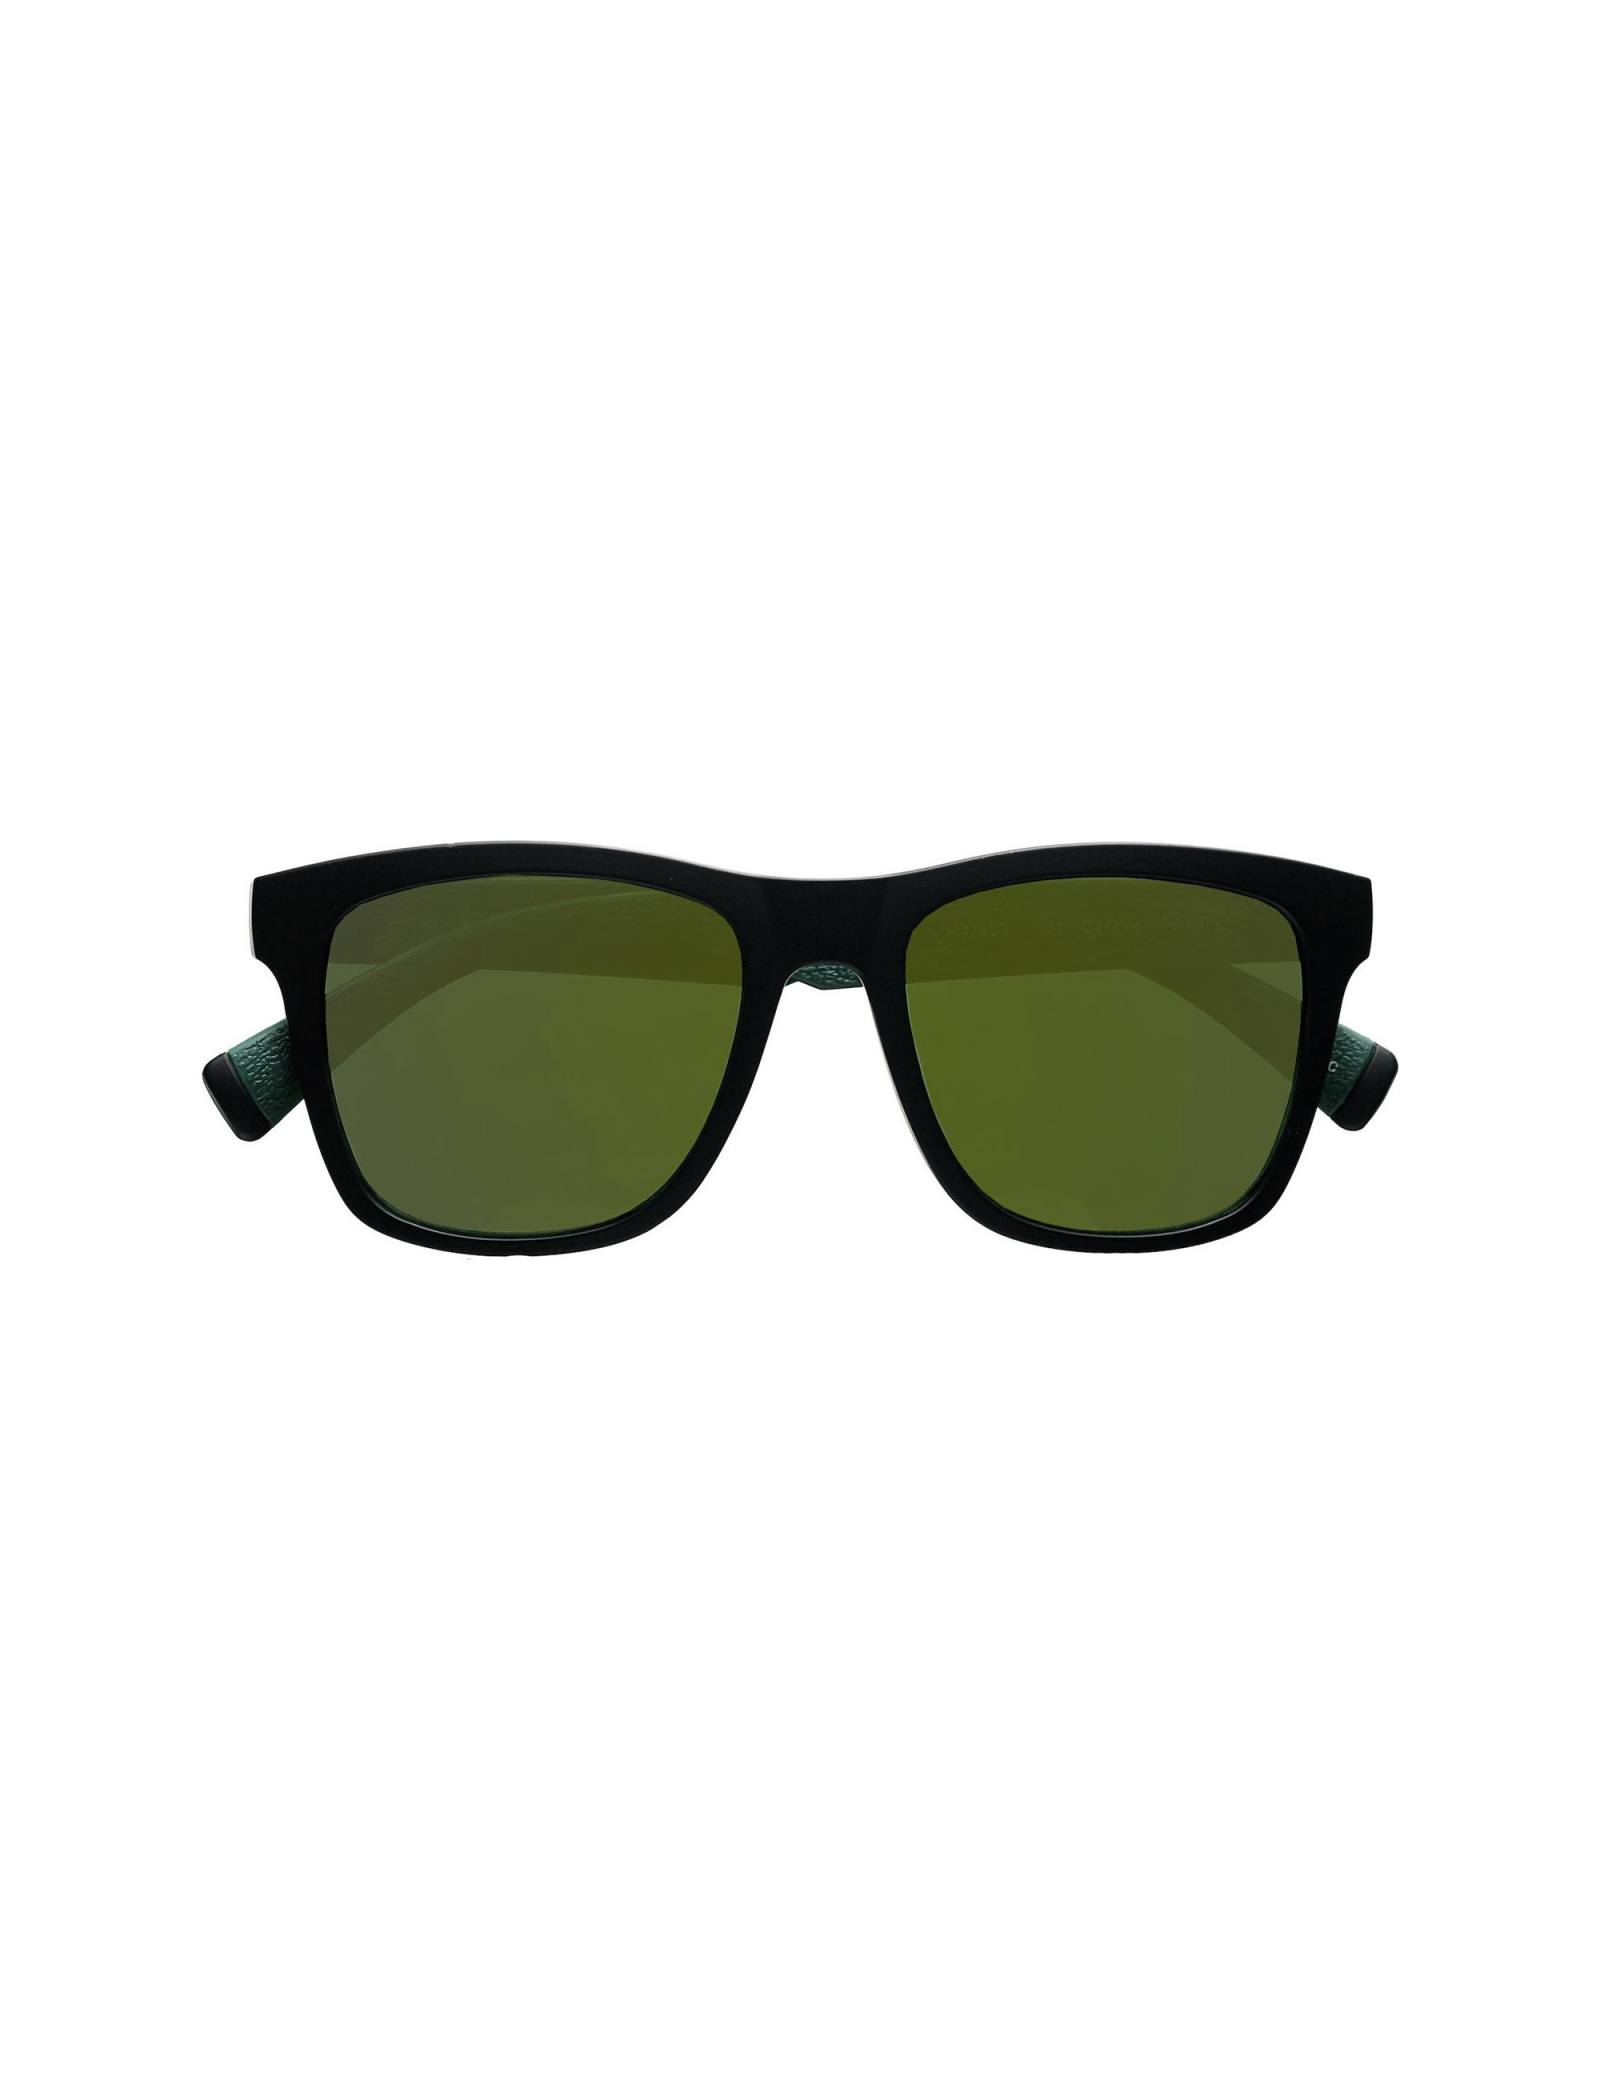 عینک آفتابی ویفرر مردانه - پپه جینز - مشکي - 1